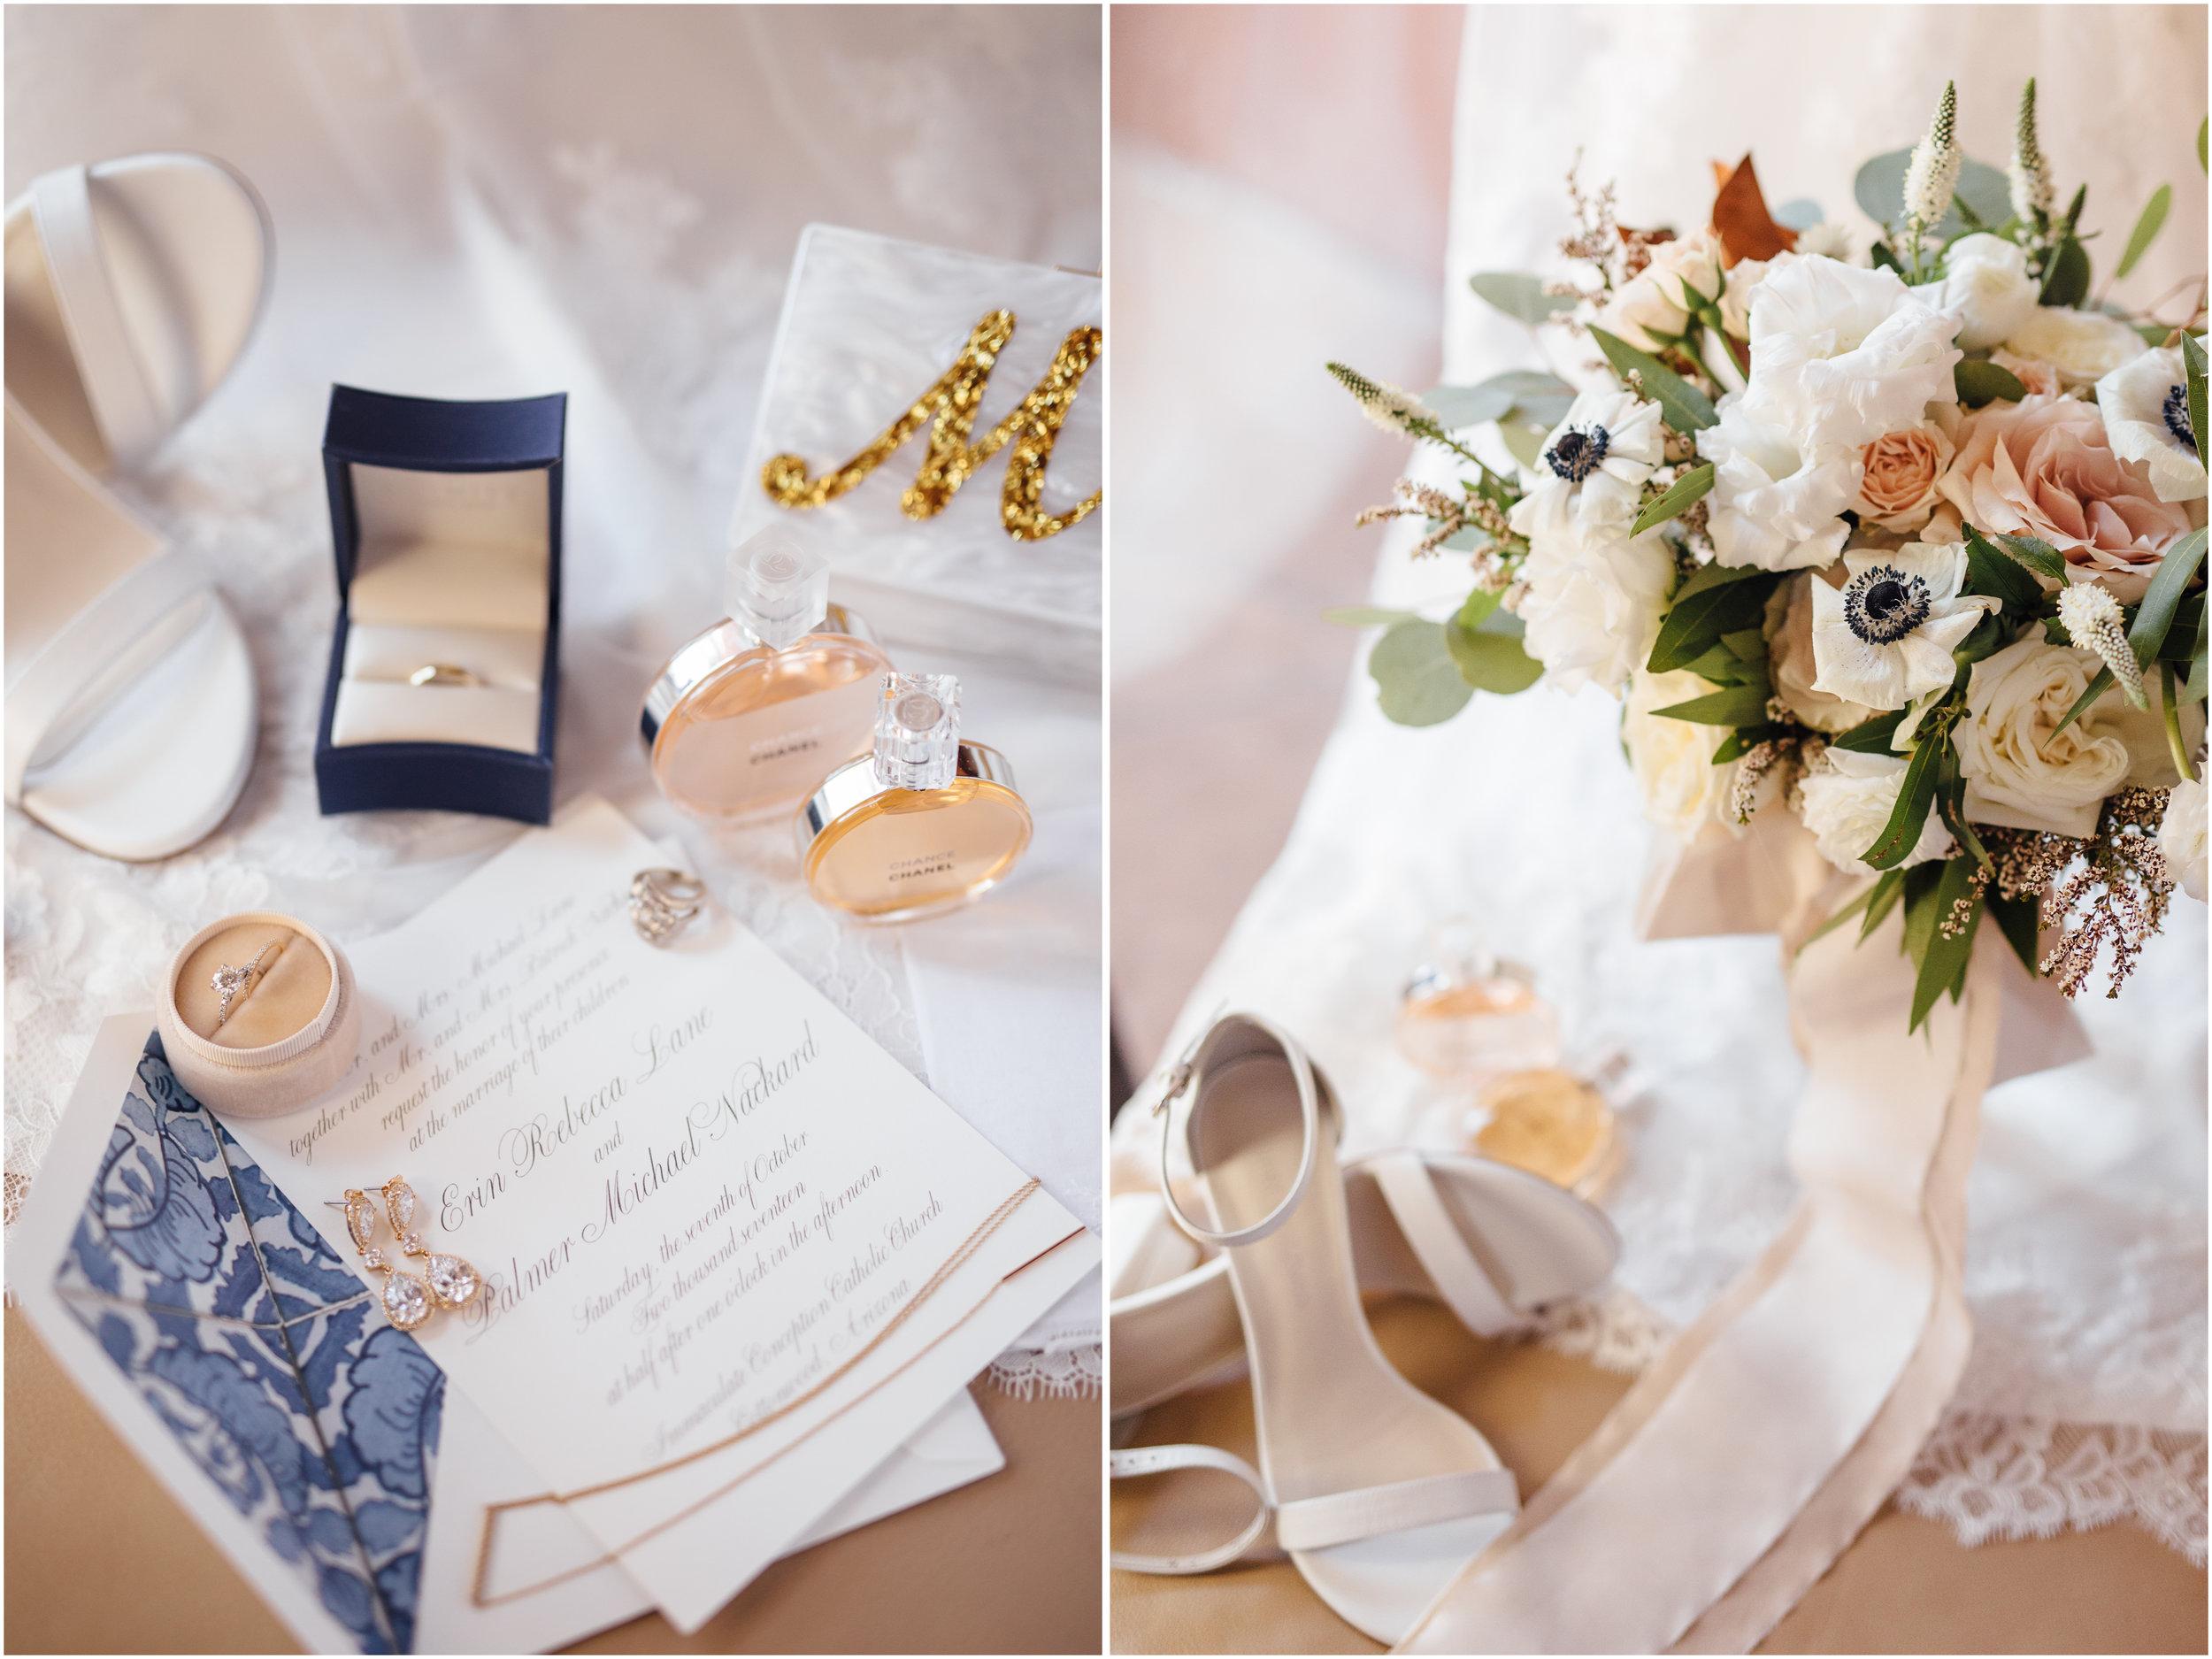 The-knot-wedding-details.jpg